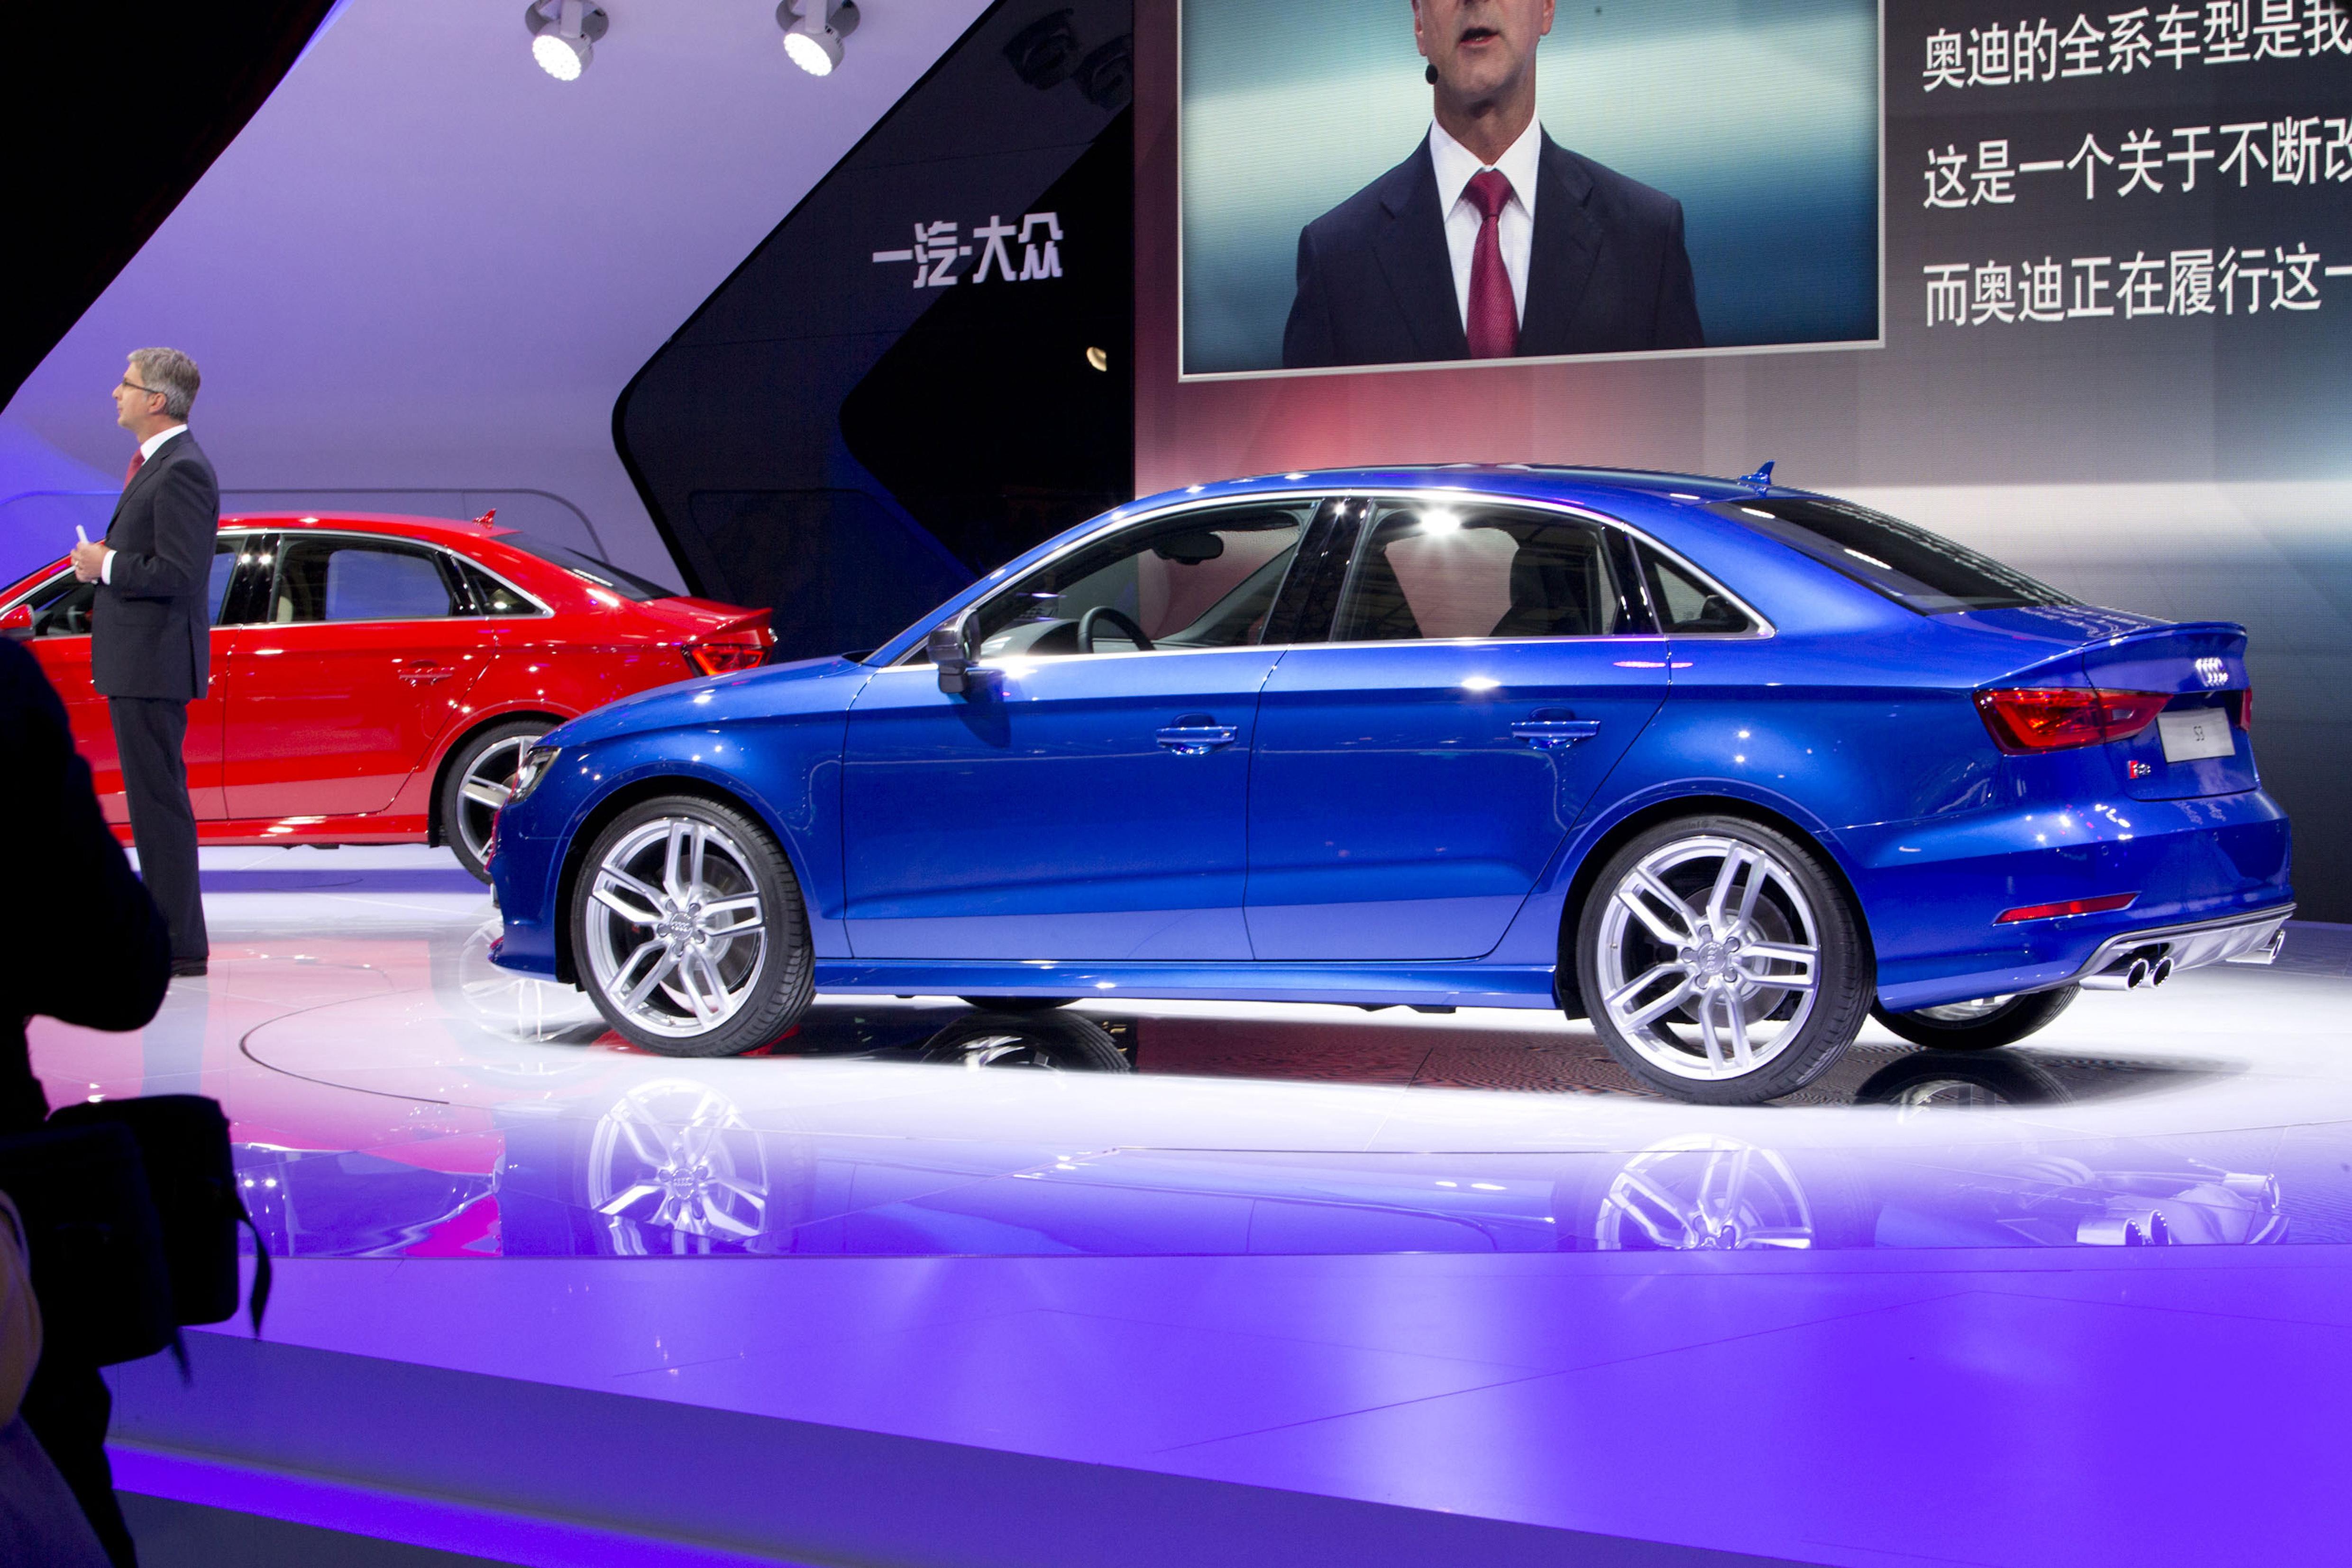 Audi s3 Sedan Blue 2015 Audi s3 Sedan 4961 x 3307